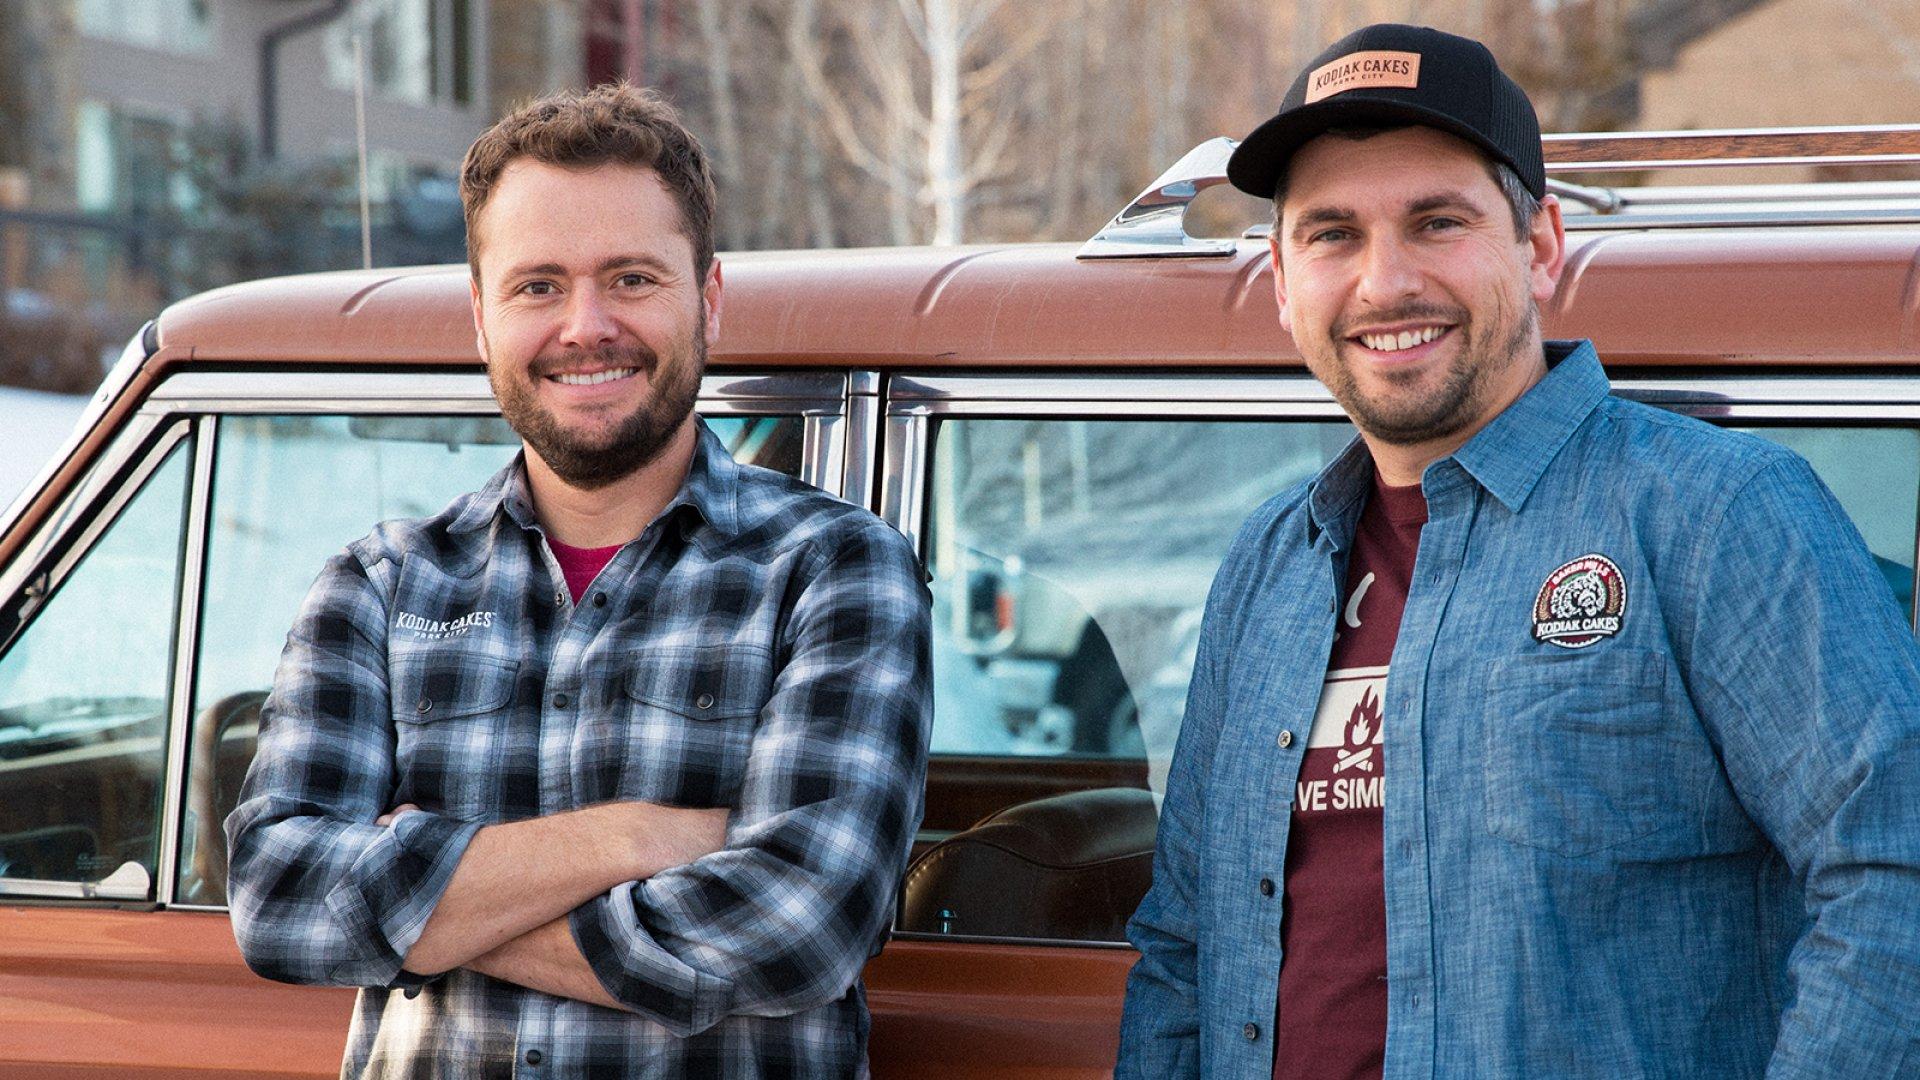 Kodiak Cakes CEO Joel Clark (left) and COO Cameron Smith.